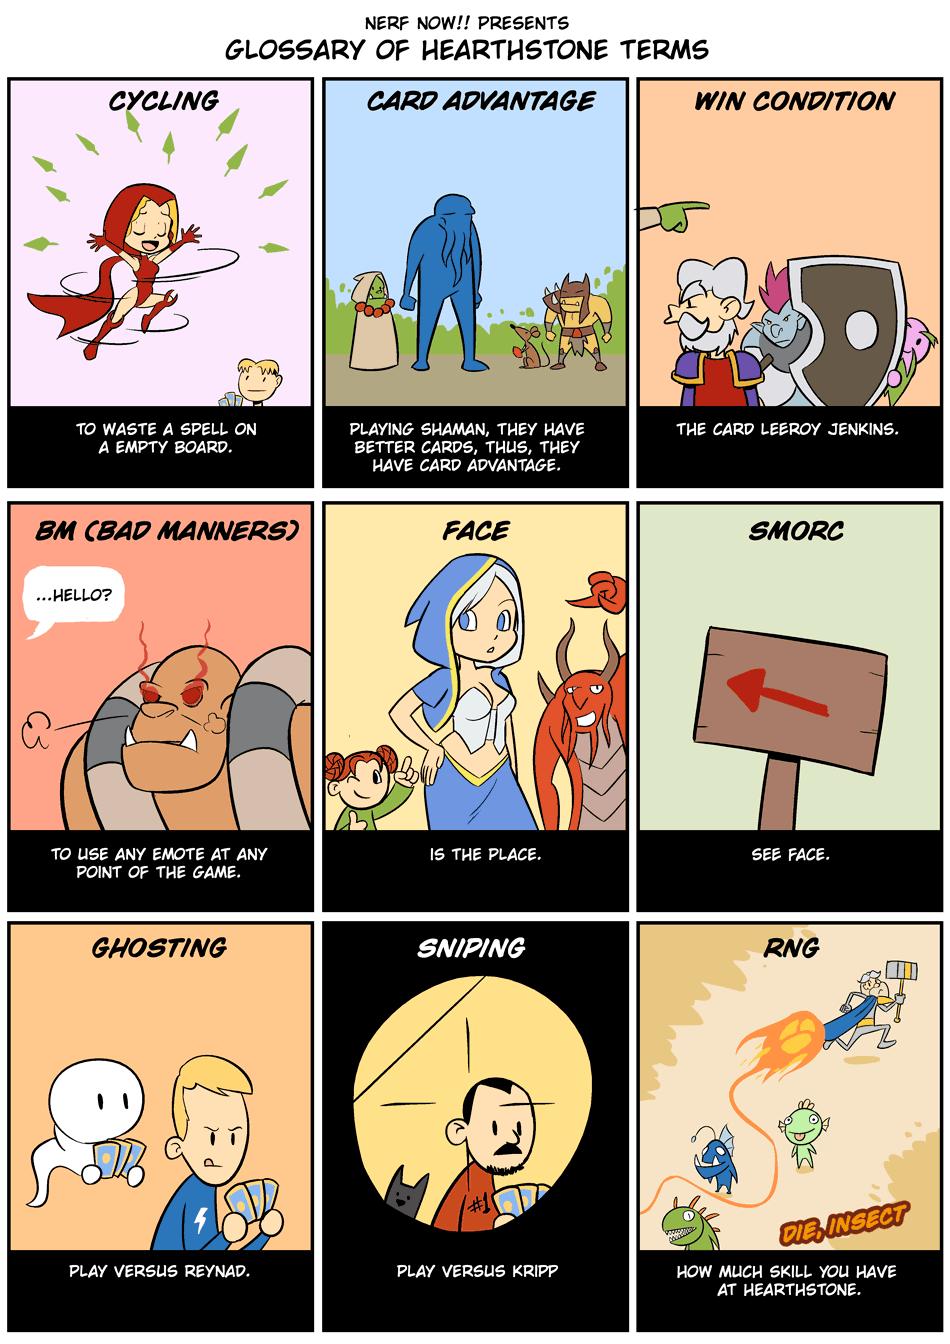 Hearthstone Glossary